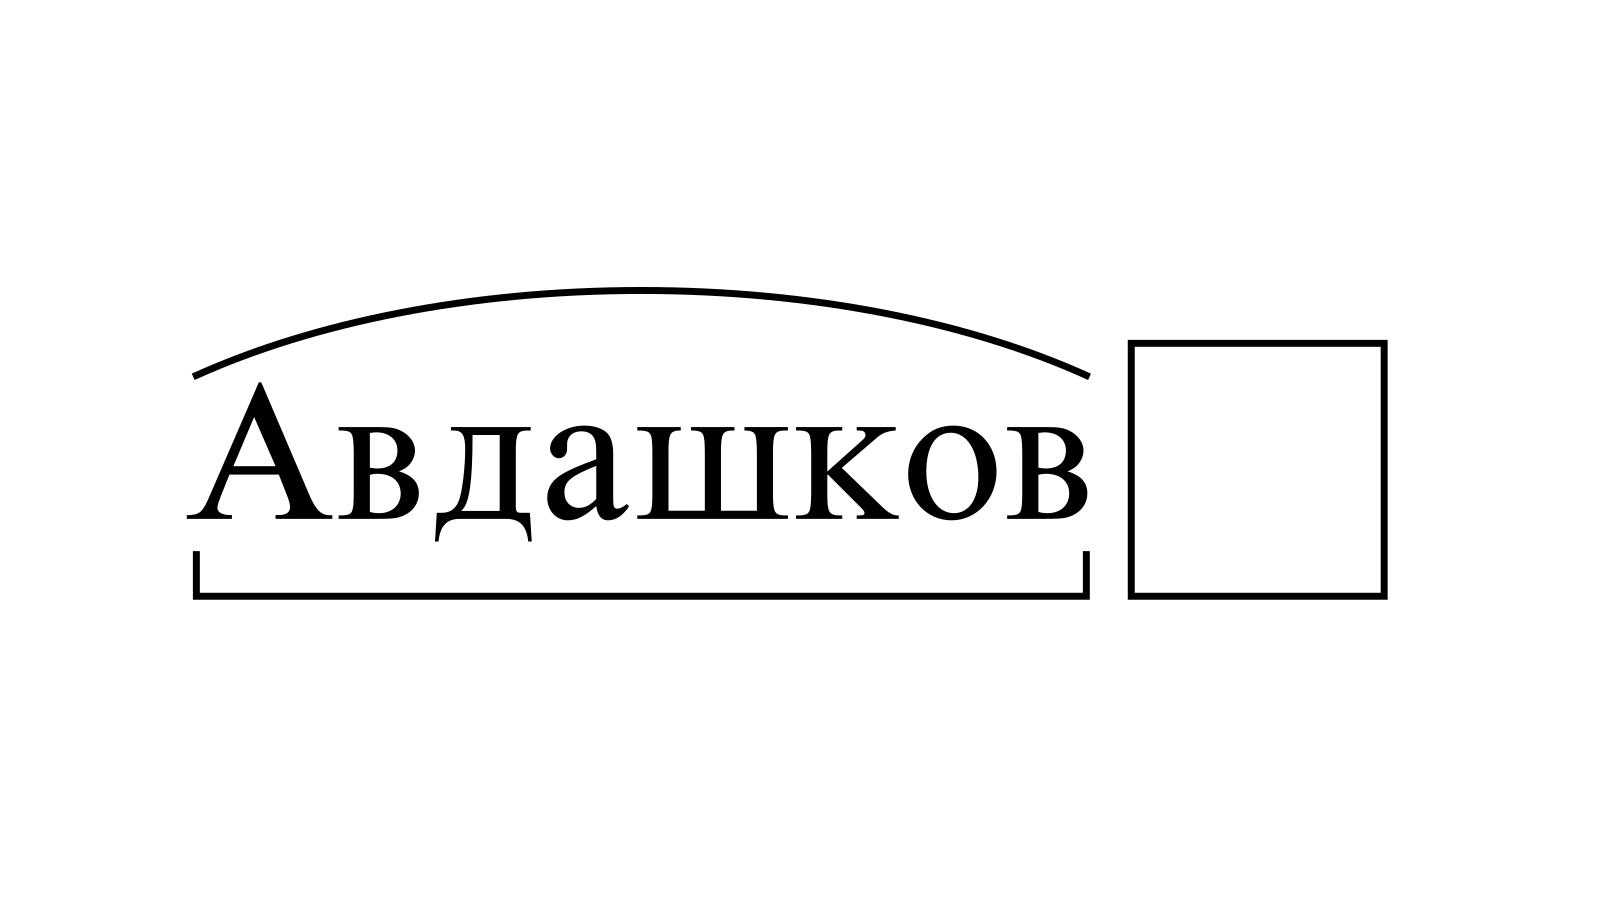 Разбор слова «Авдашков» по составу